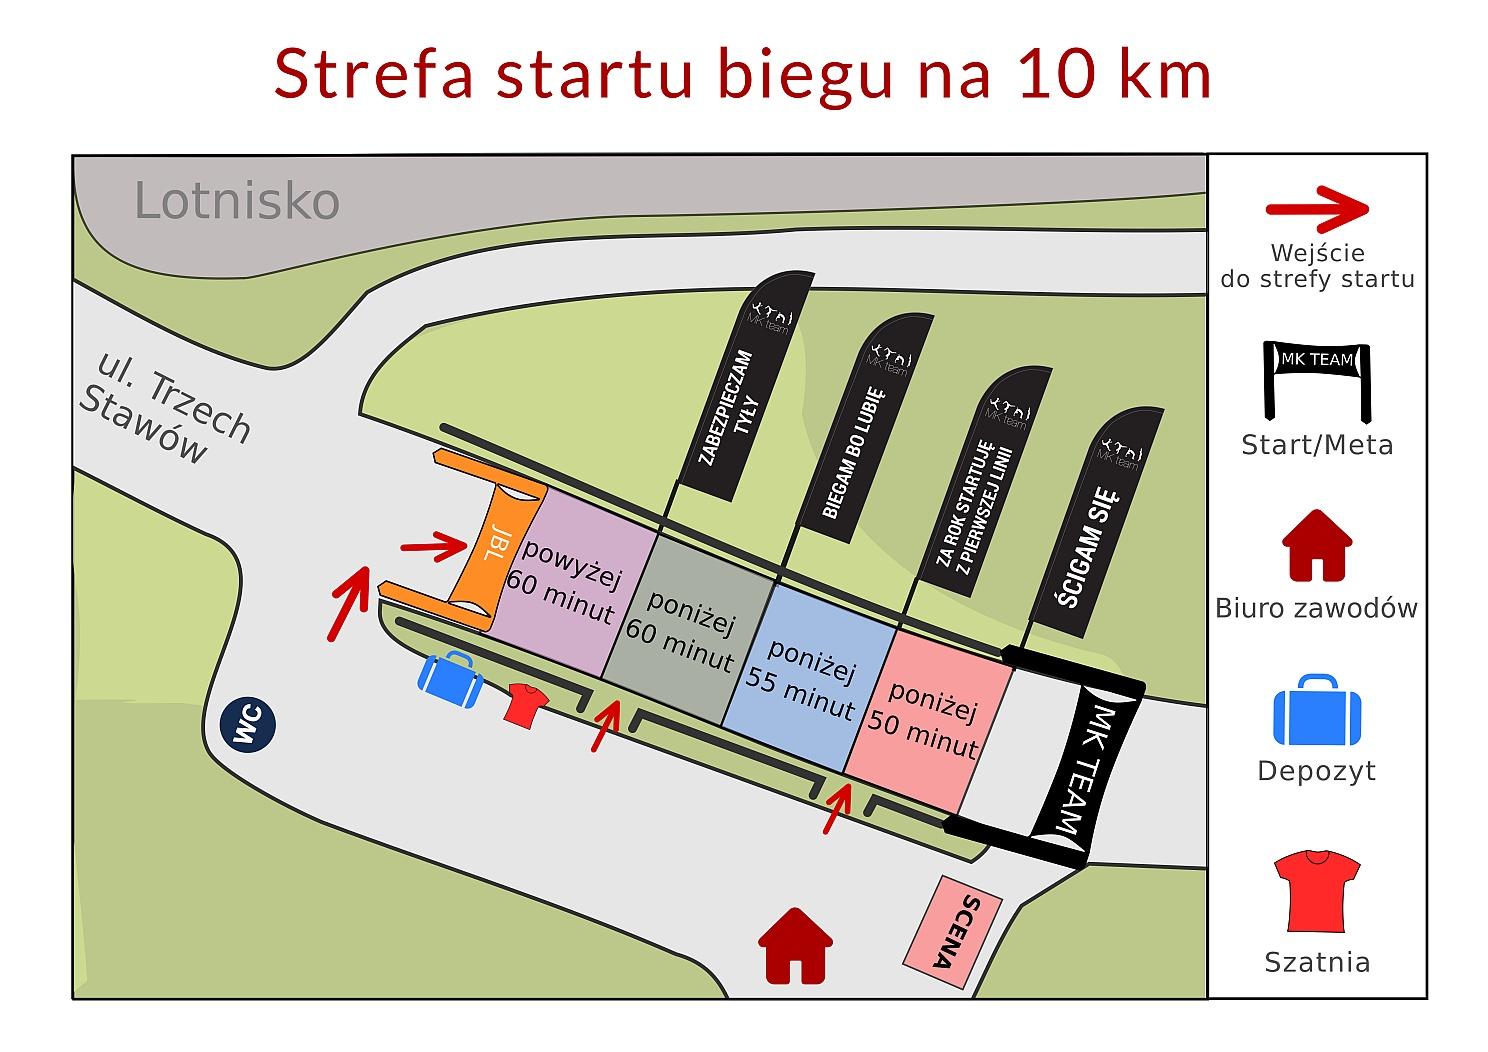 Mapa staru biegu na 10 km